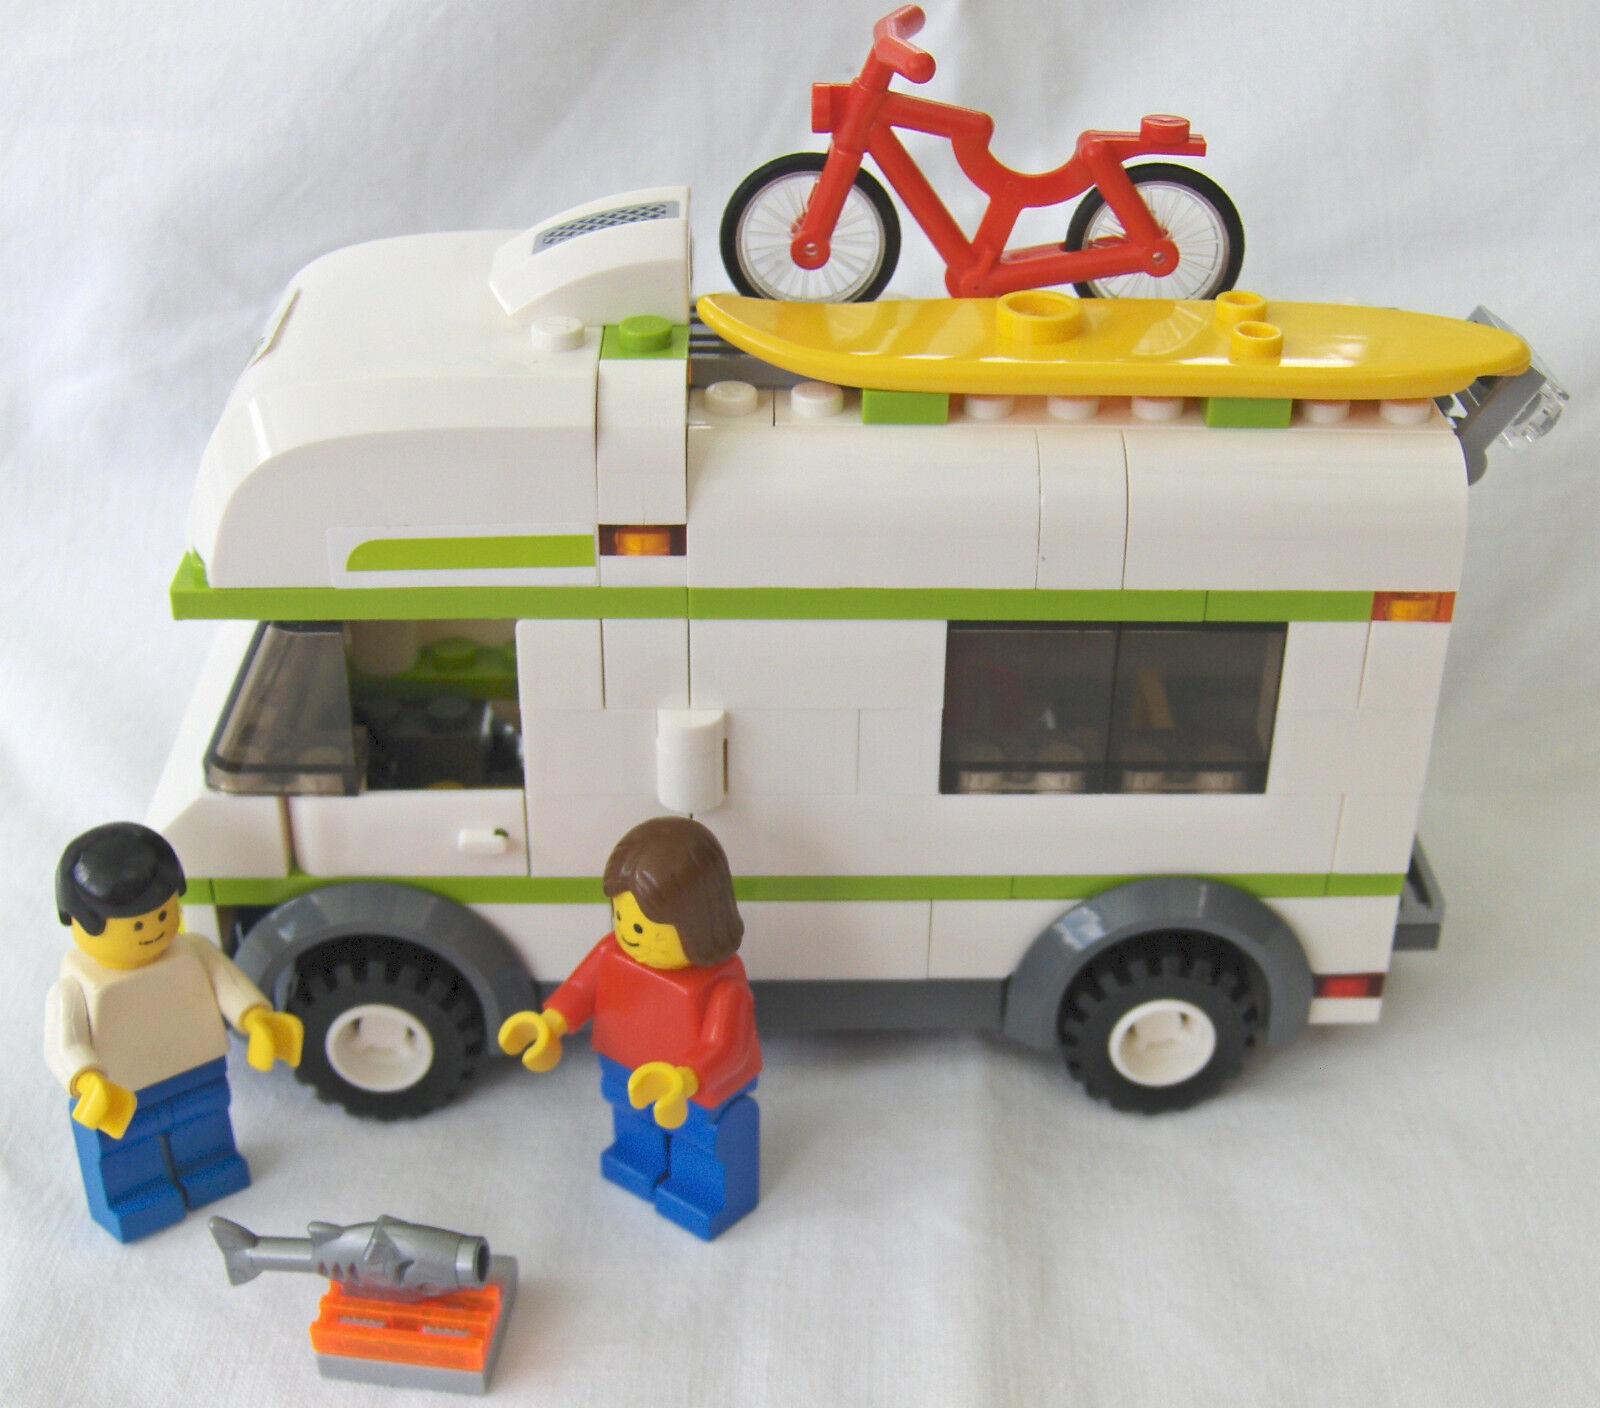 Nvombk2156 SeriesComplete Lego City 7639townamp; Camper Set reQCoWdxB